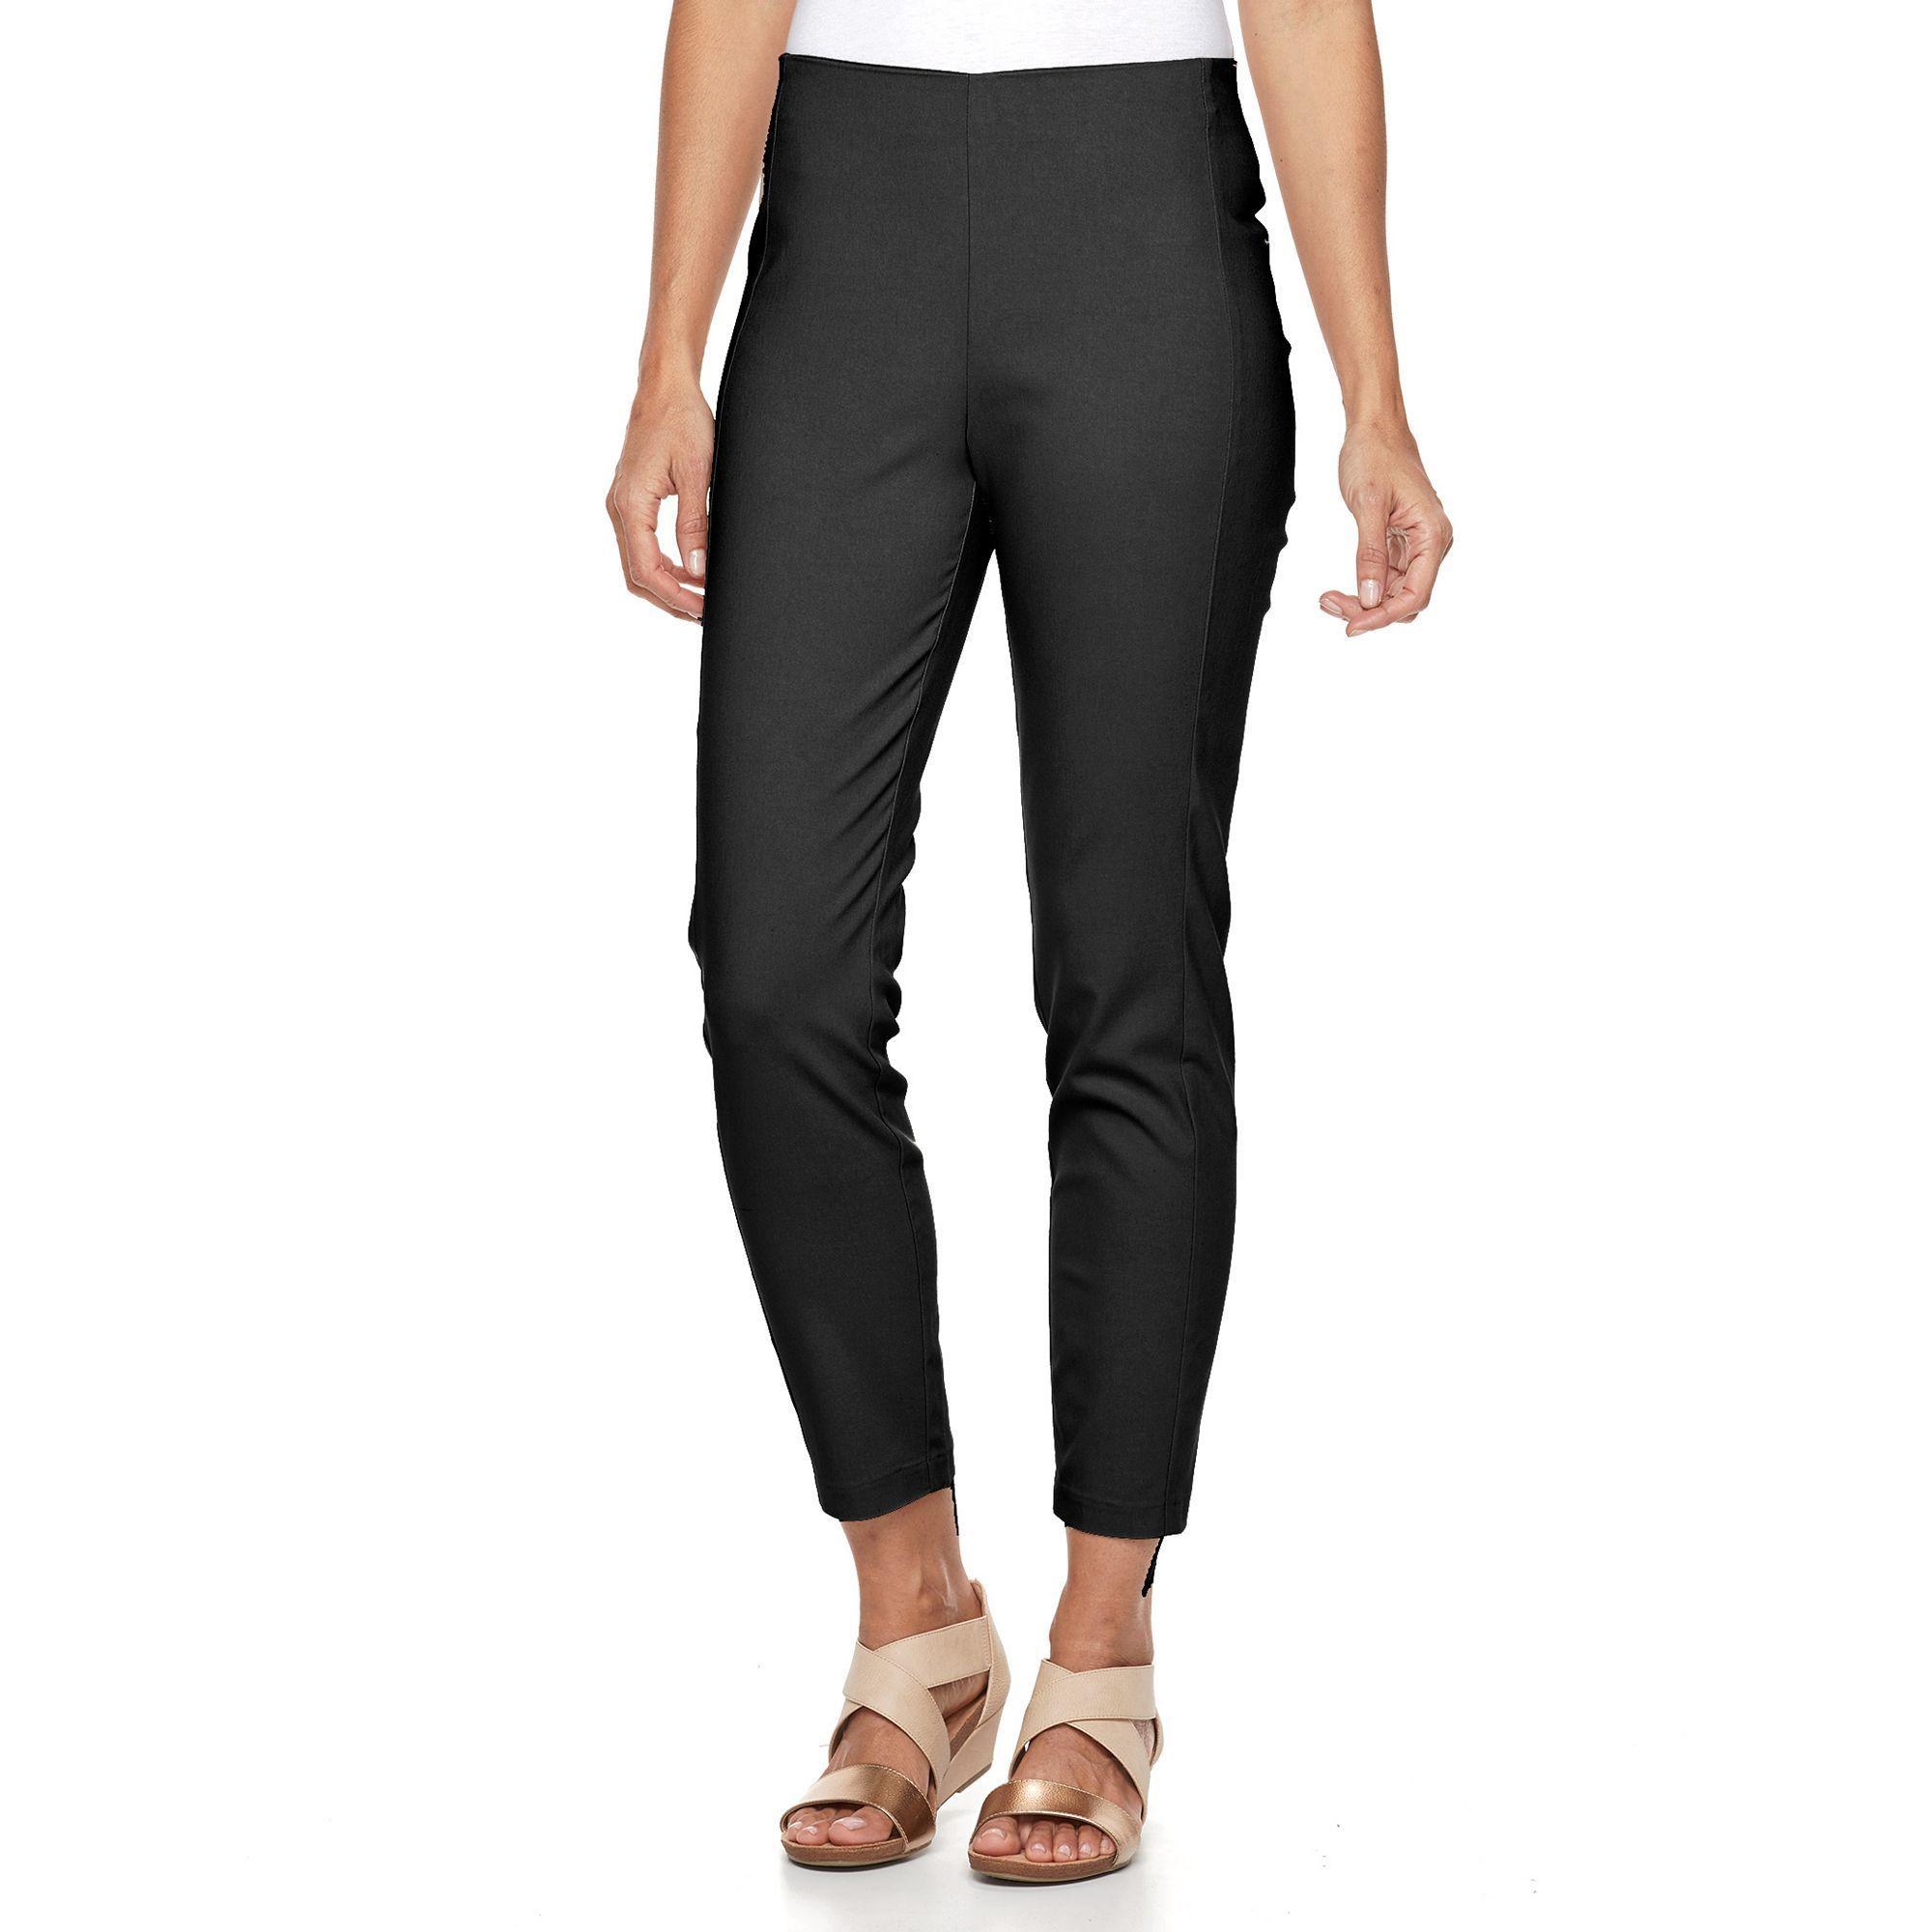 Women's Croft & Barrow® Slim Ankle Pants, Size: 16, Black